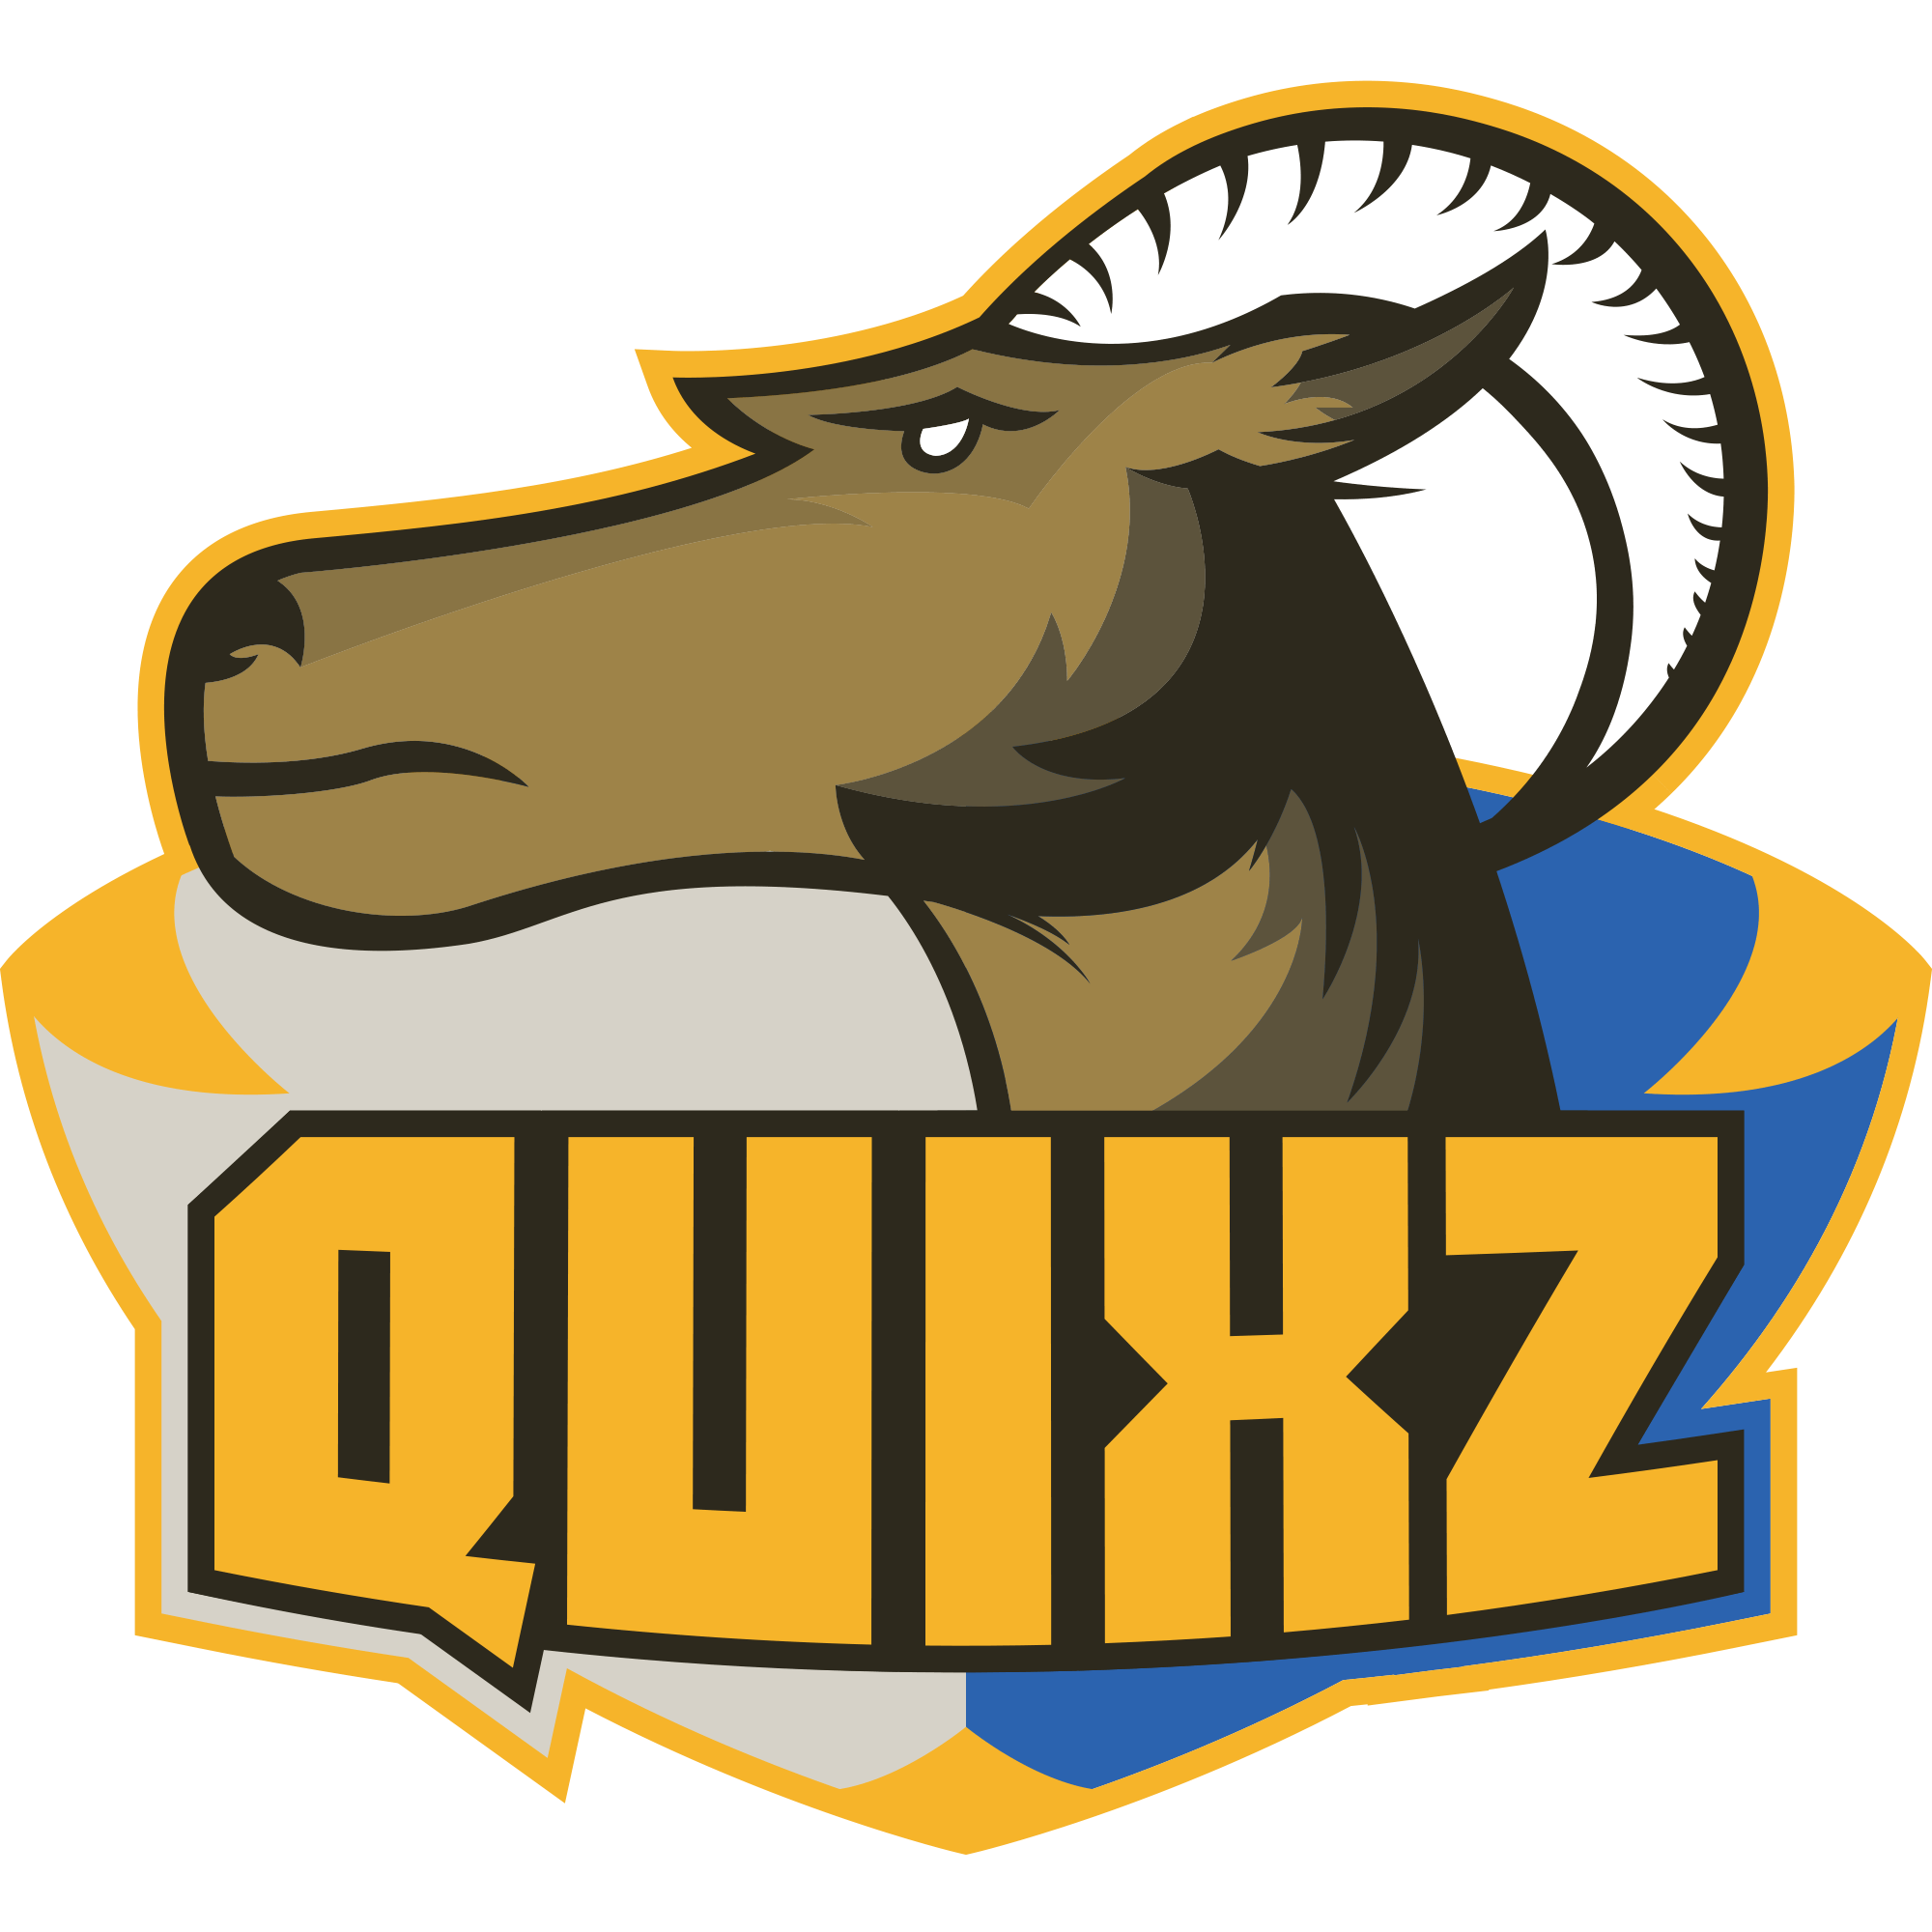 Quixz eSports logo